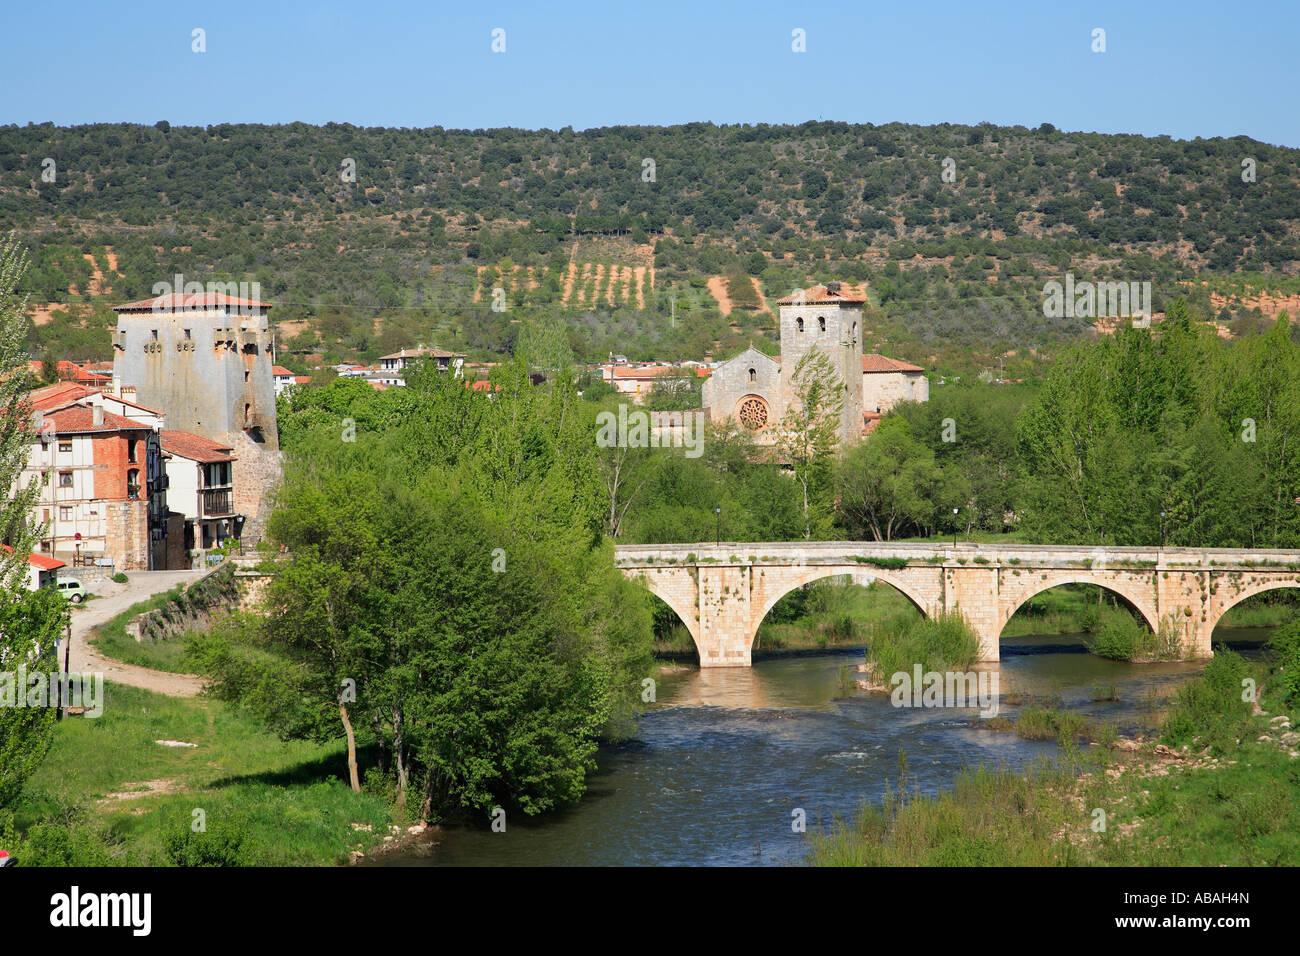 Spain Castilla Leon Covarrubias general view - Stock Image